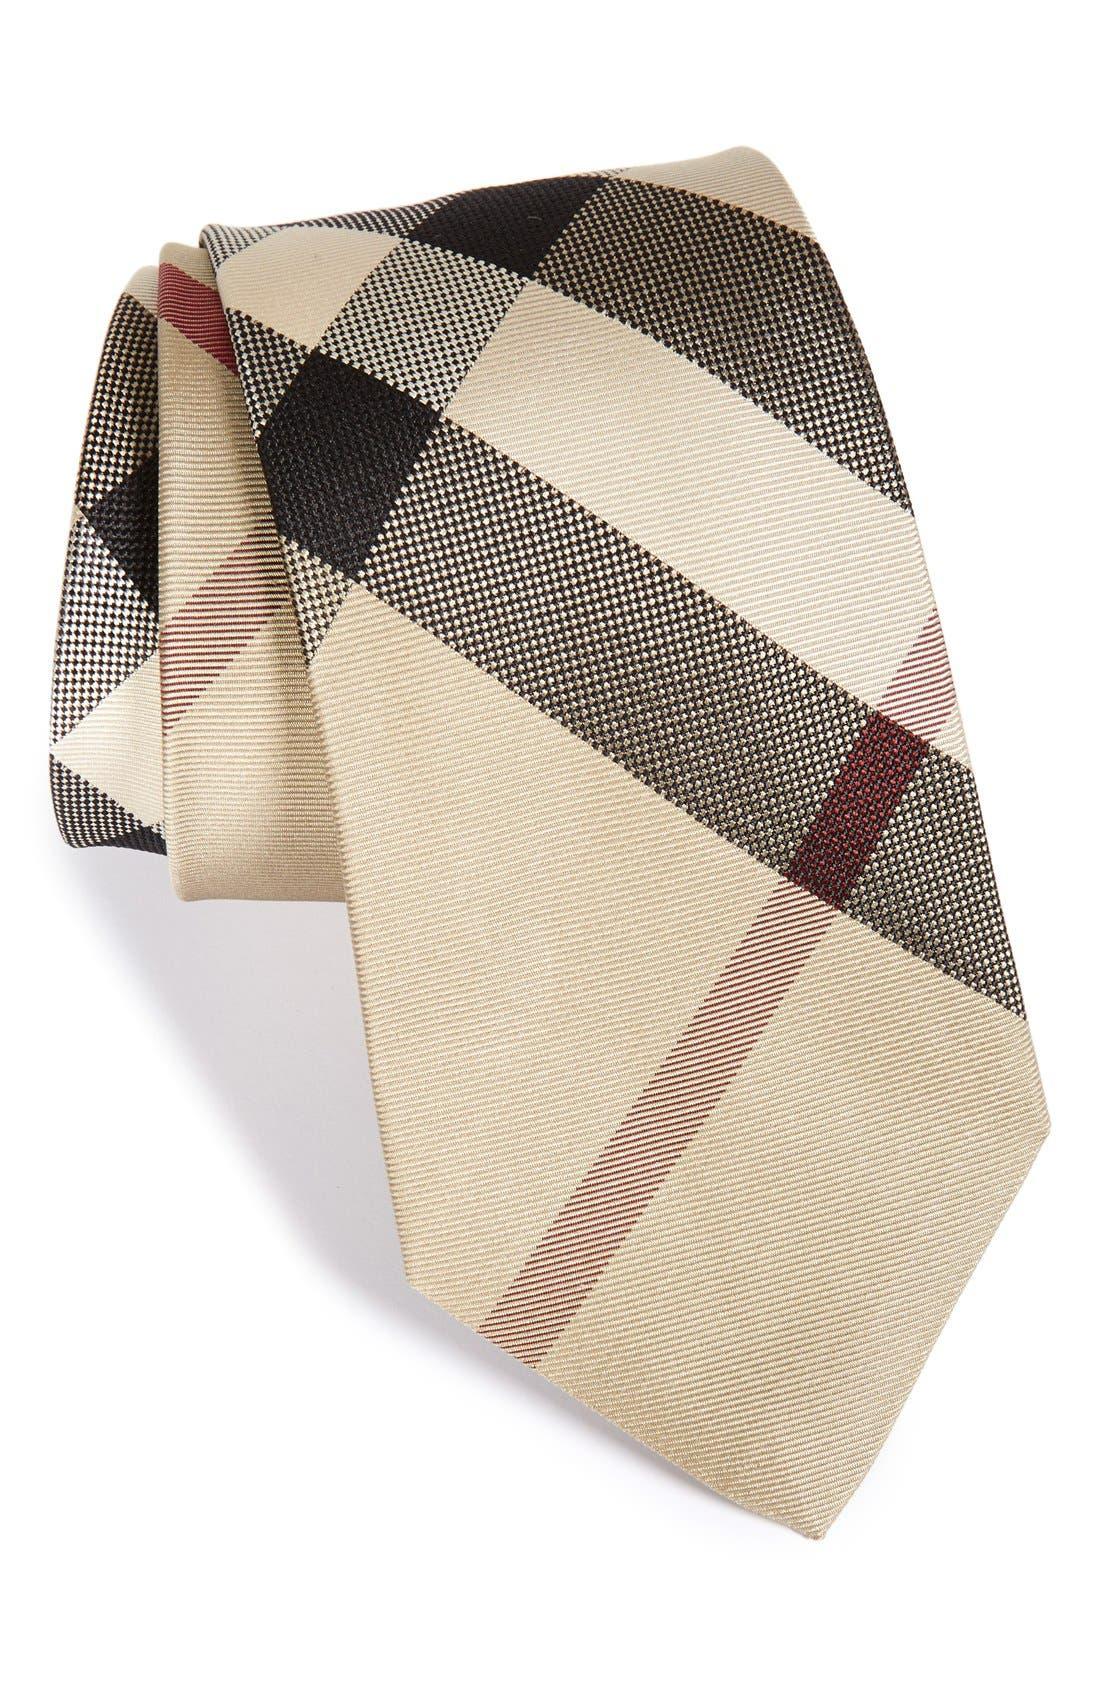 Main Image - Burberry 'Manston' Woven Silk Tie